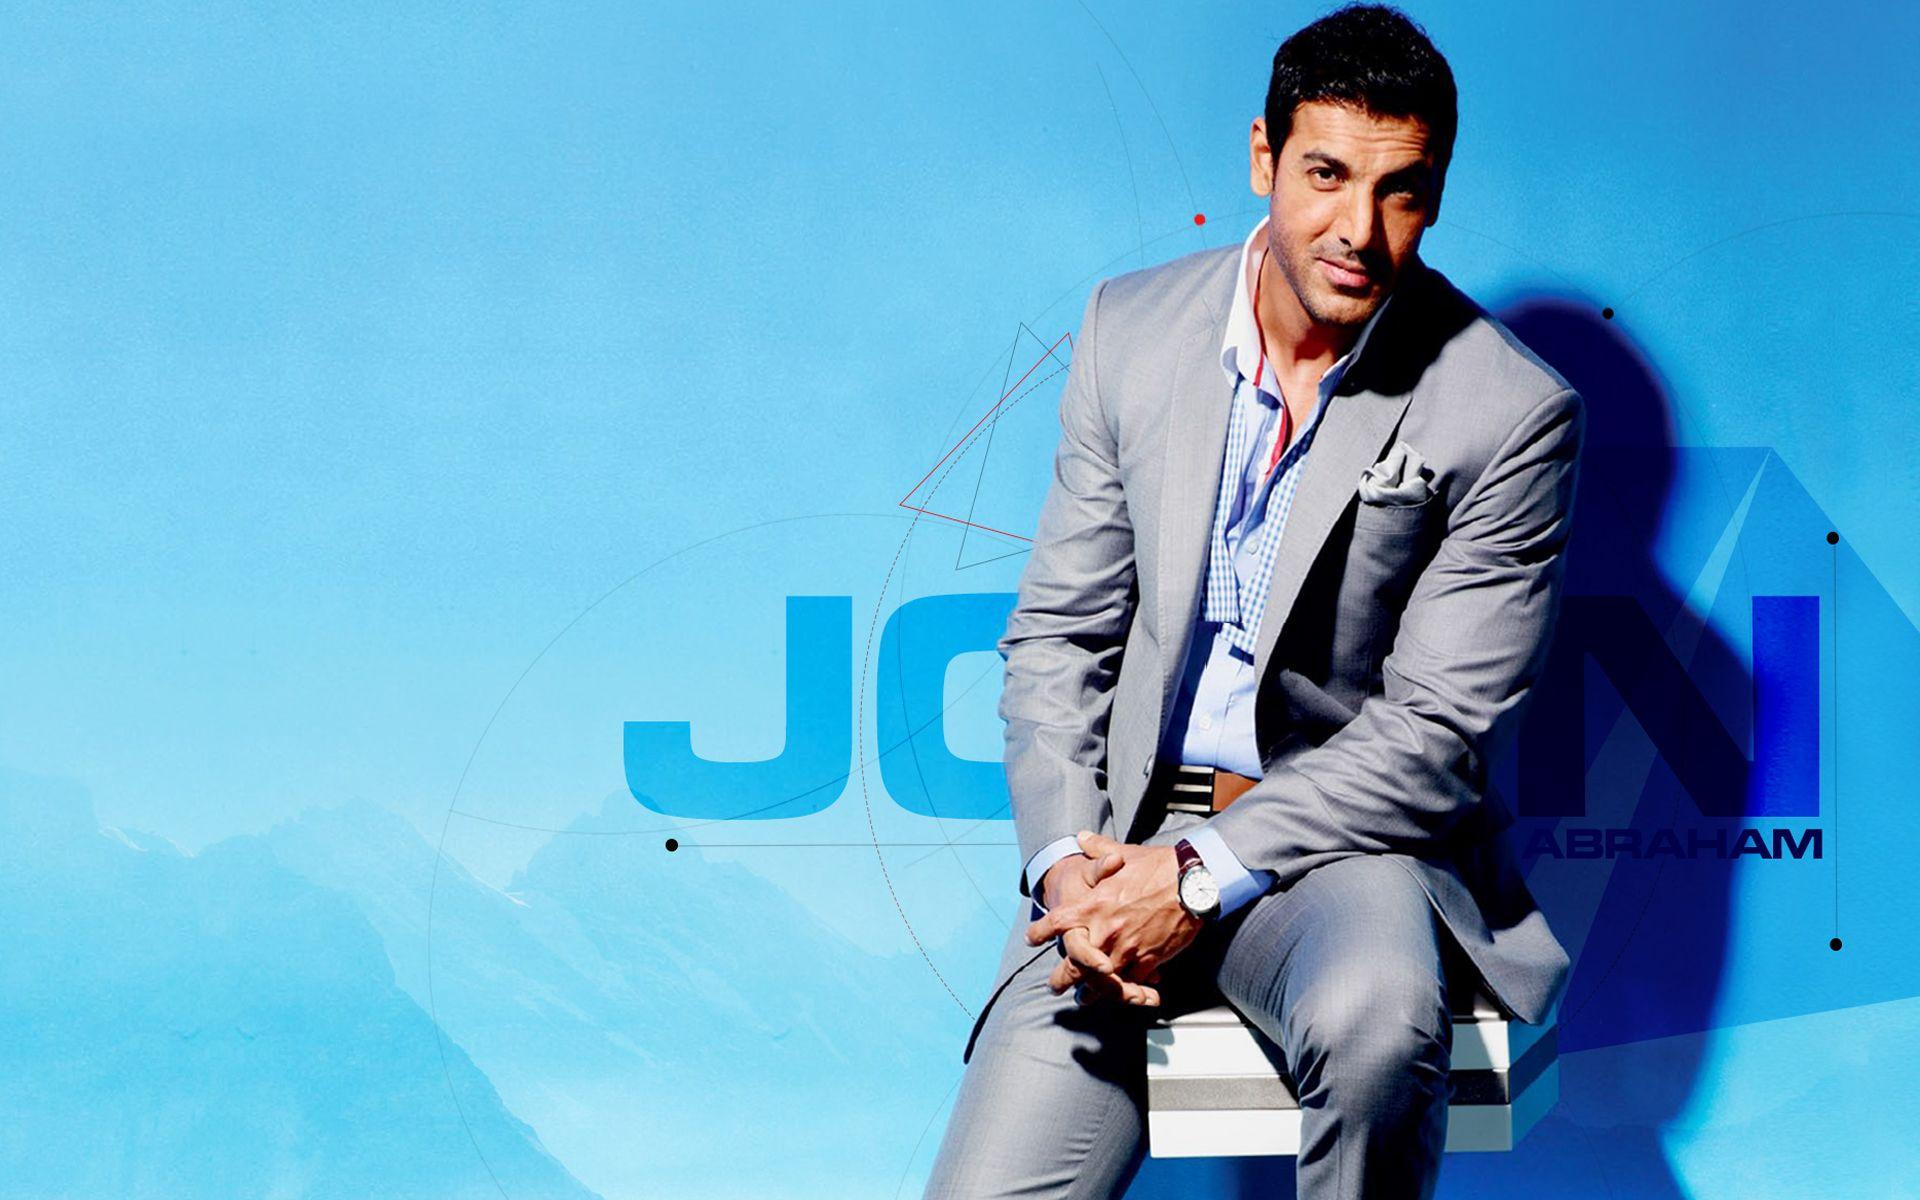 Wallpaper download bollywood actors - Dashing John Abraham Hd Wallpaper John Abraham Bollywood Actor Hd Wallpapers 1080p